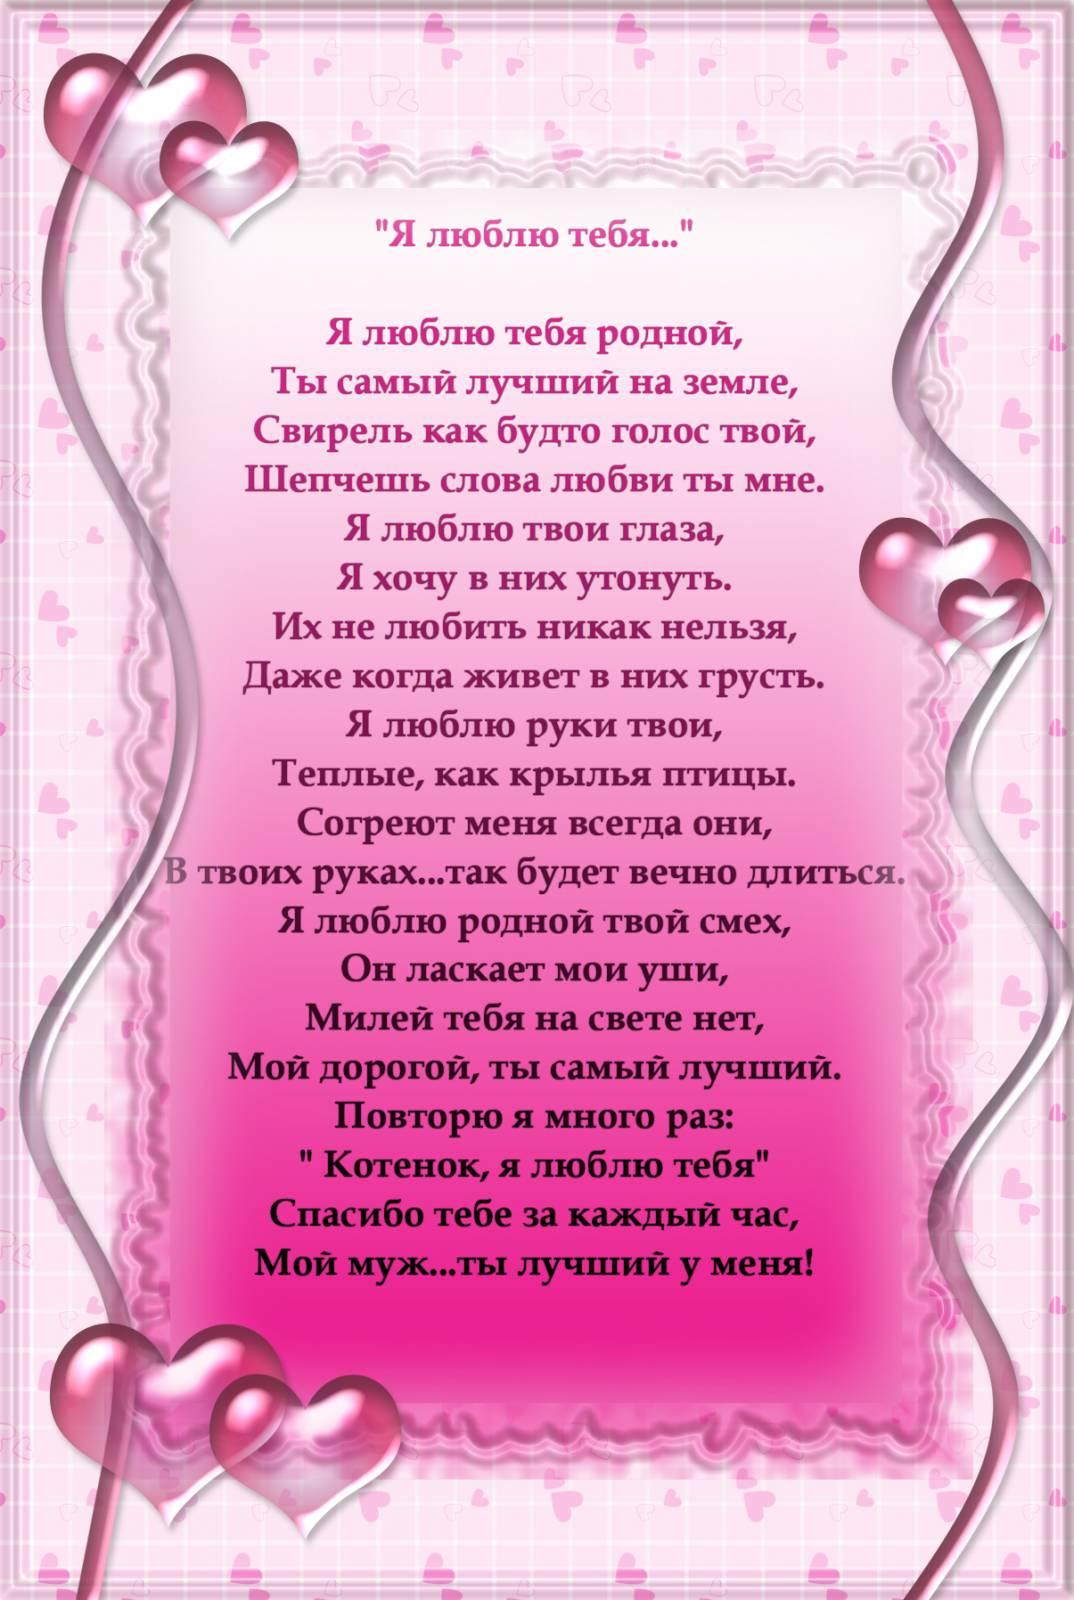 Стихи любимому мужу, мая